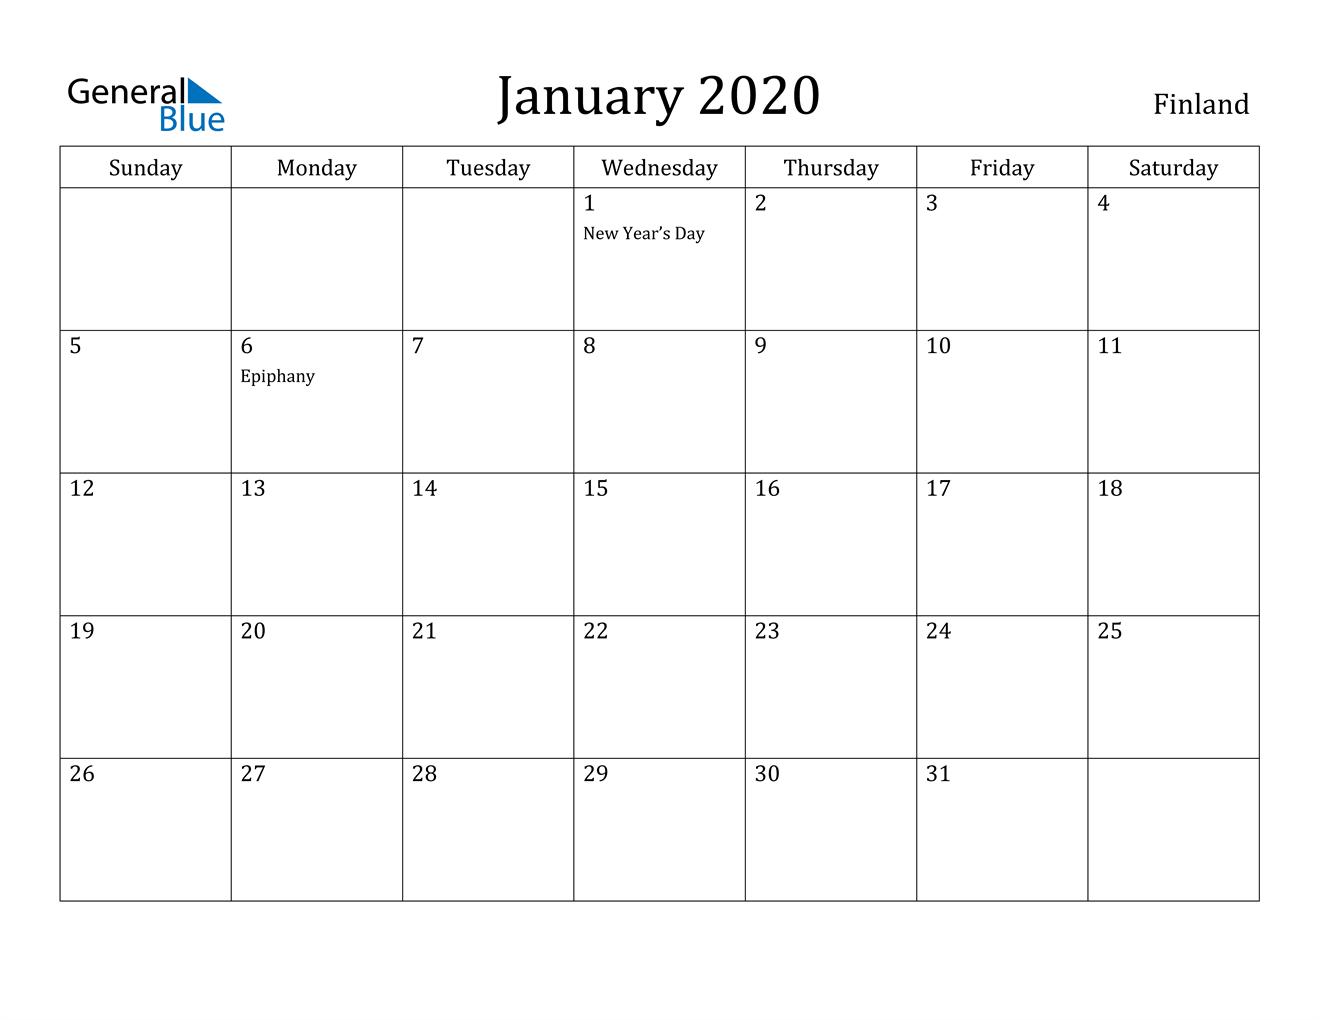 Image of January 2020 Finland Calendar with Holidays Calendar